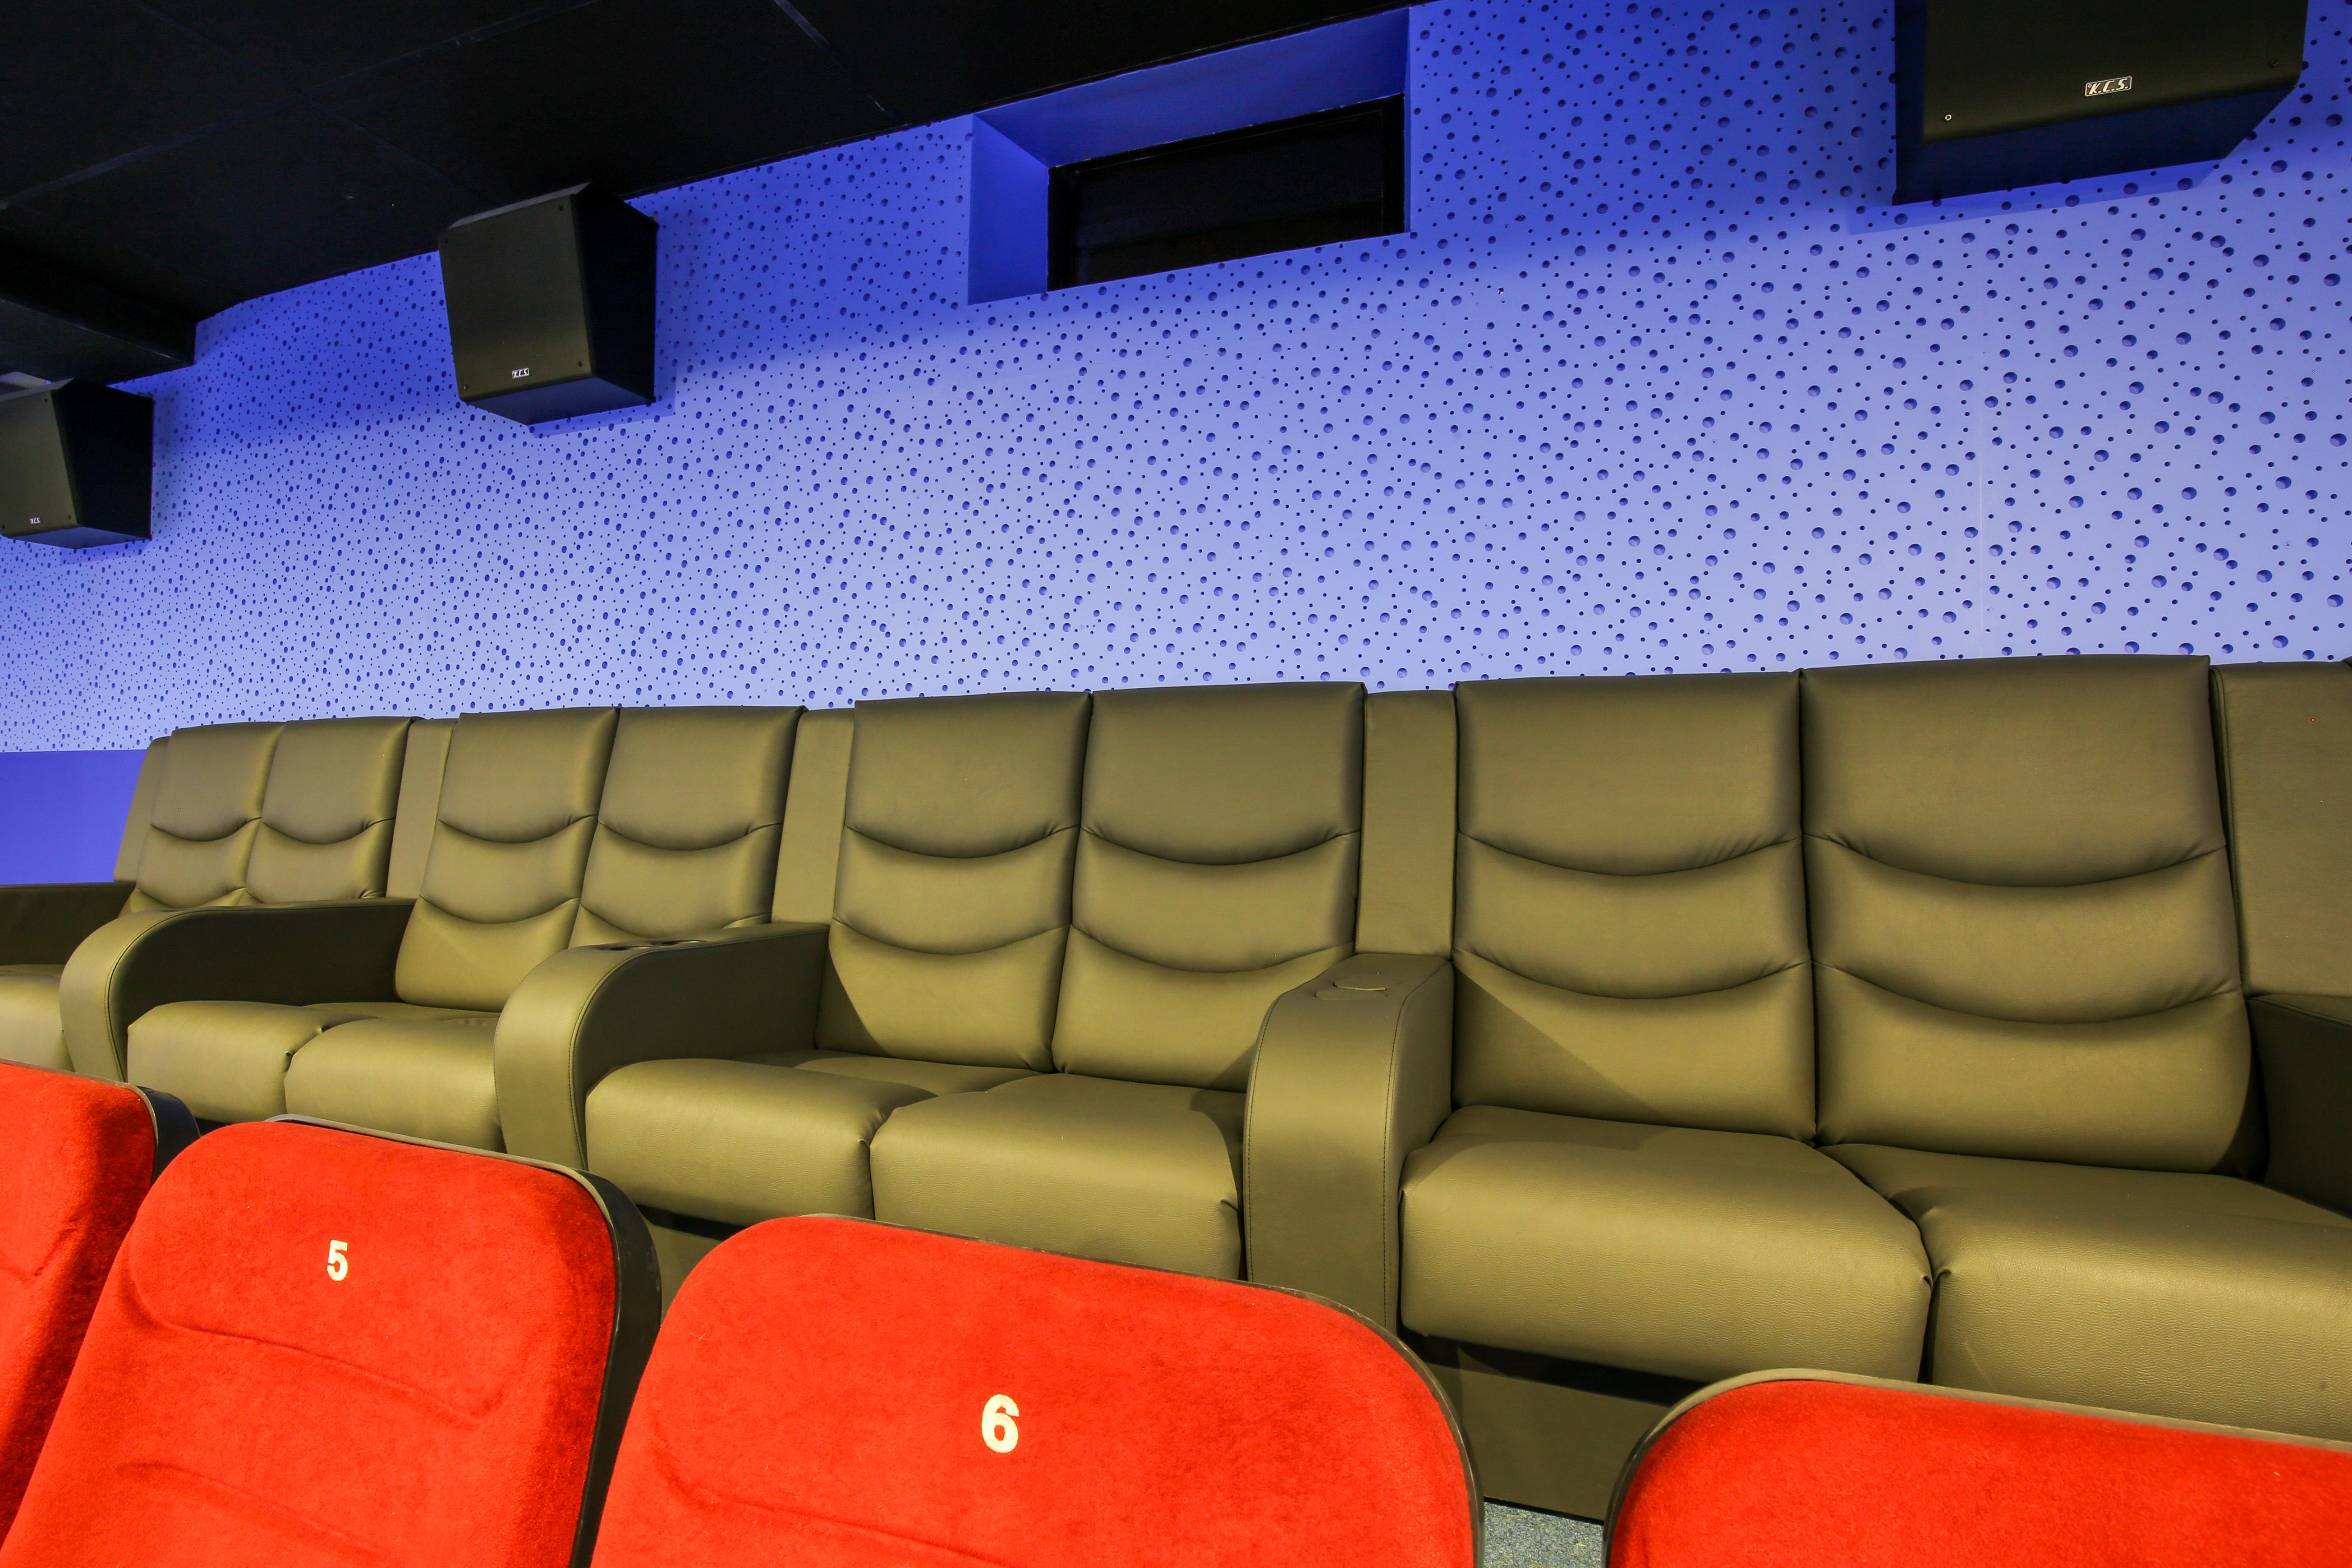 Секс на задних креслах в кино зале